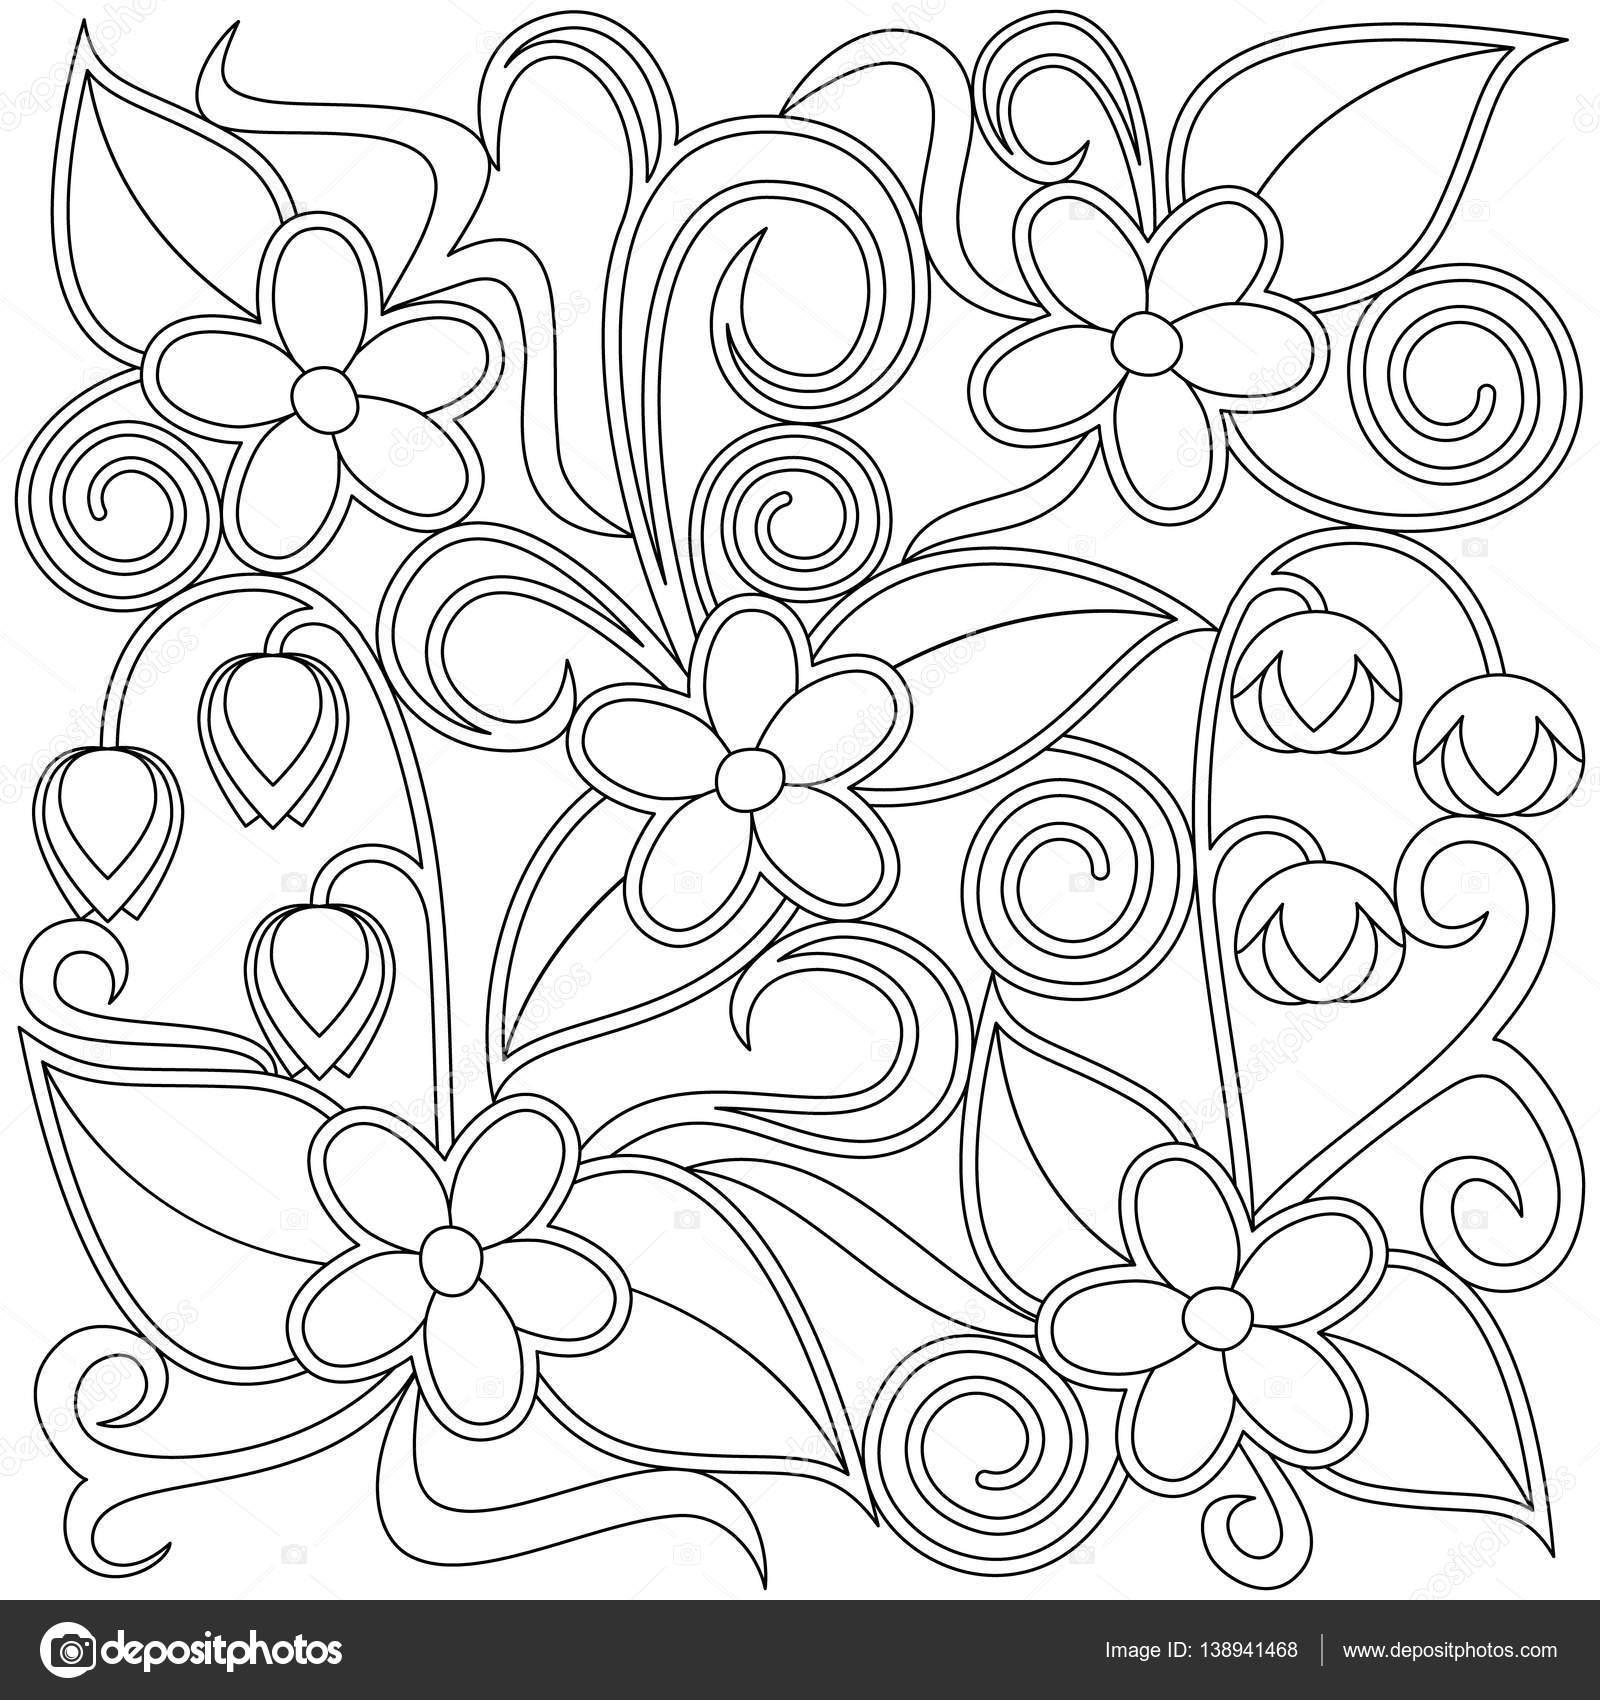 Floral Coloring Page Stock Vector C Vectoramac 138941468